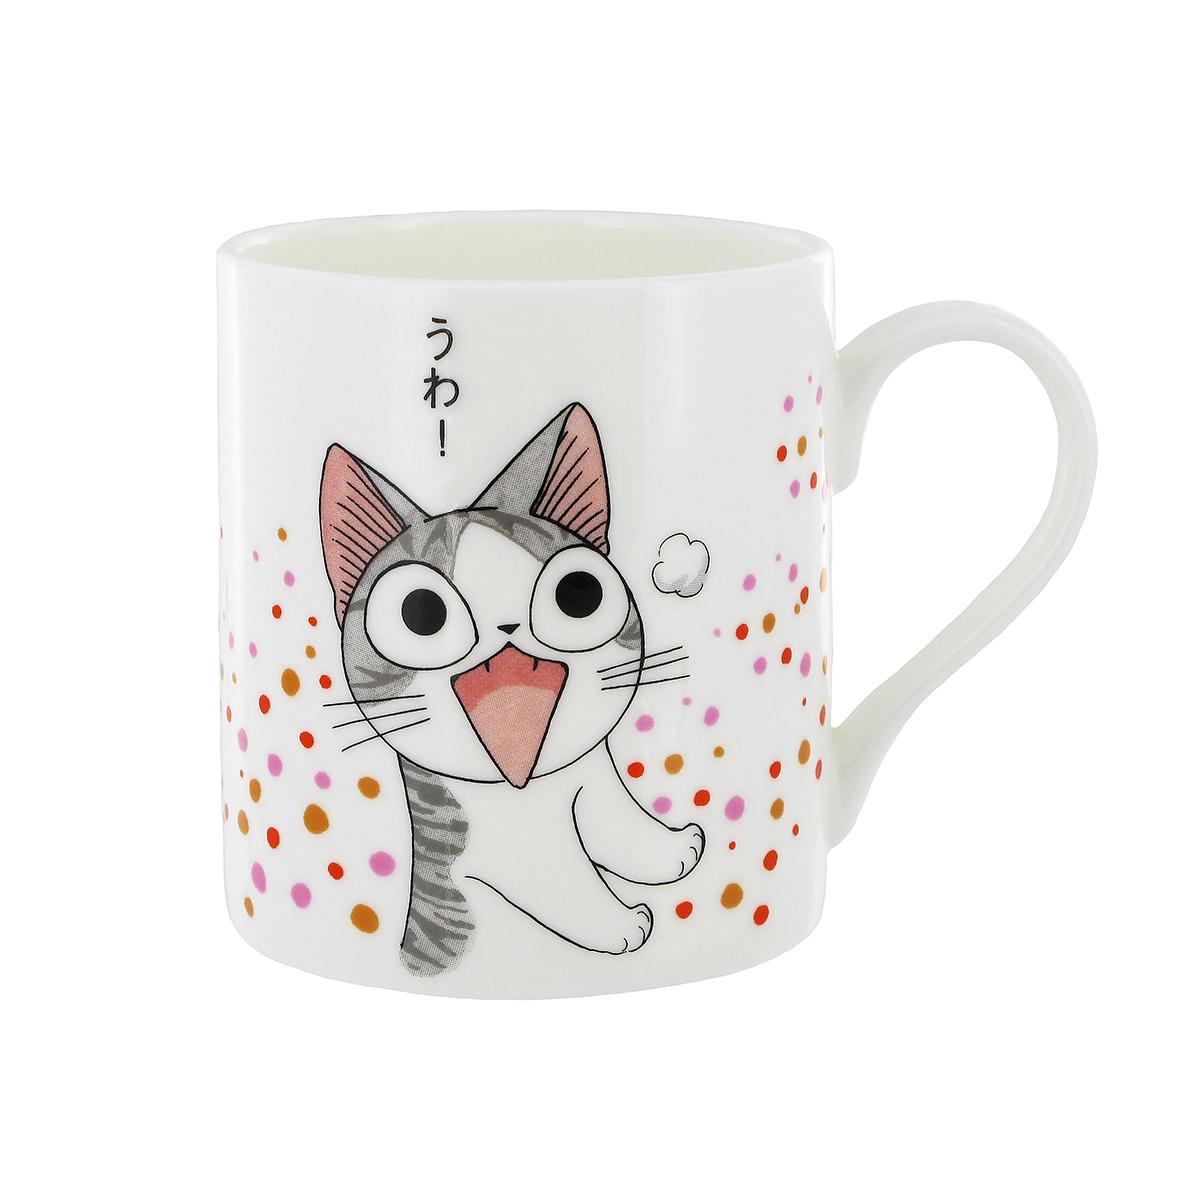 Chi's Sweet Home mug